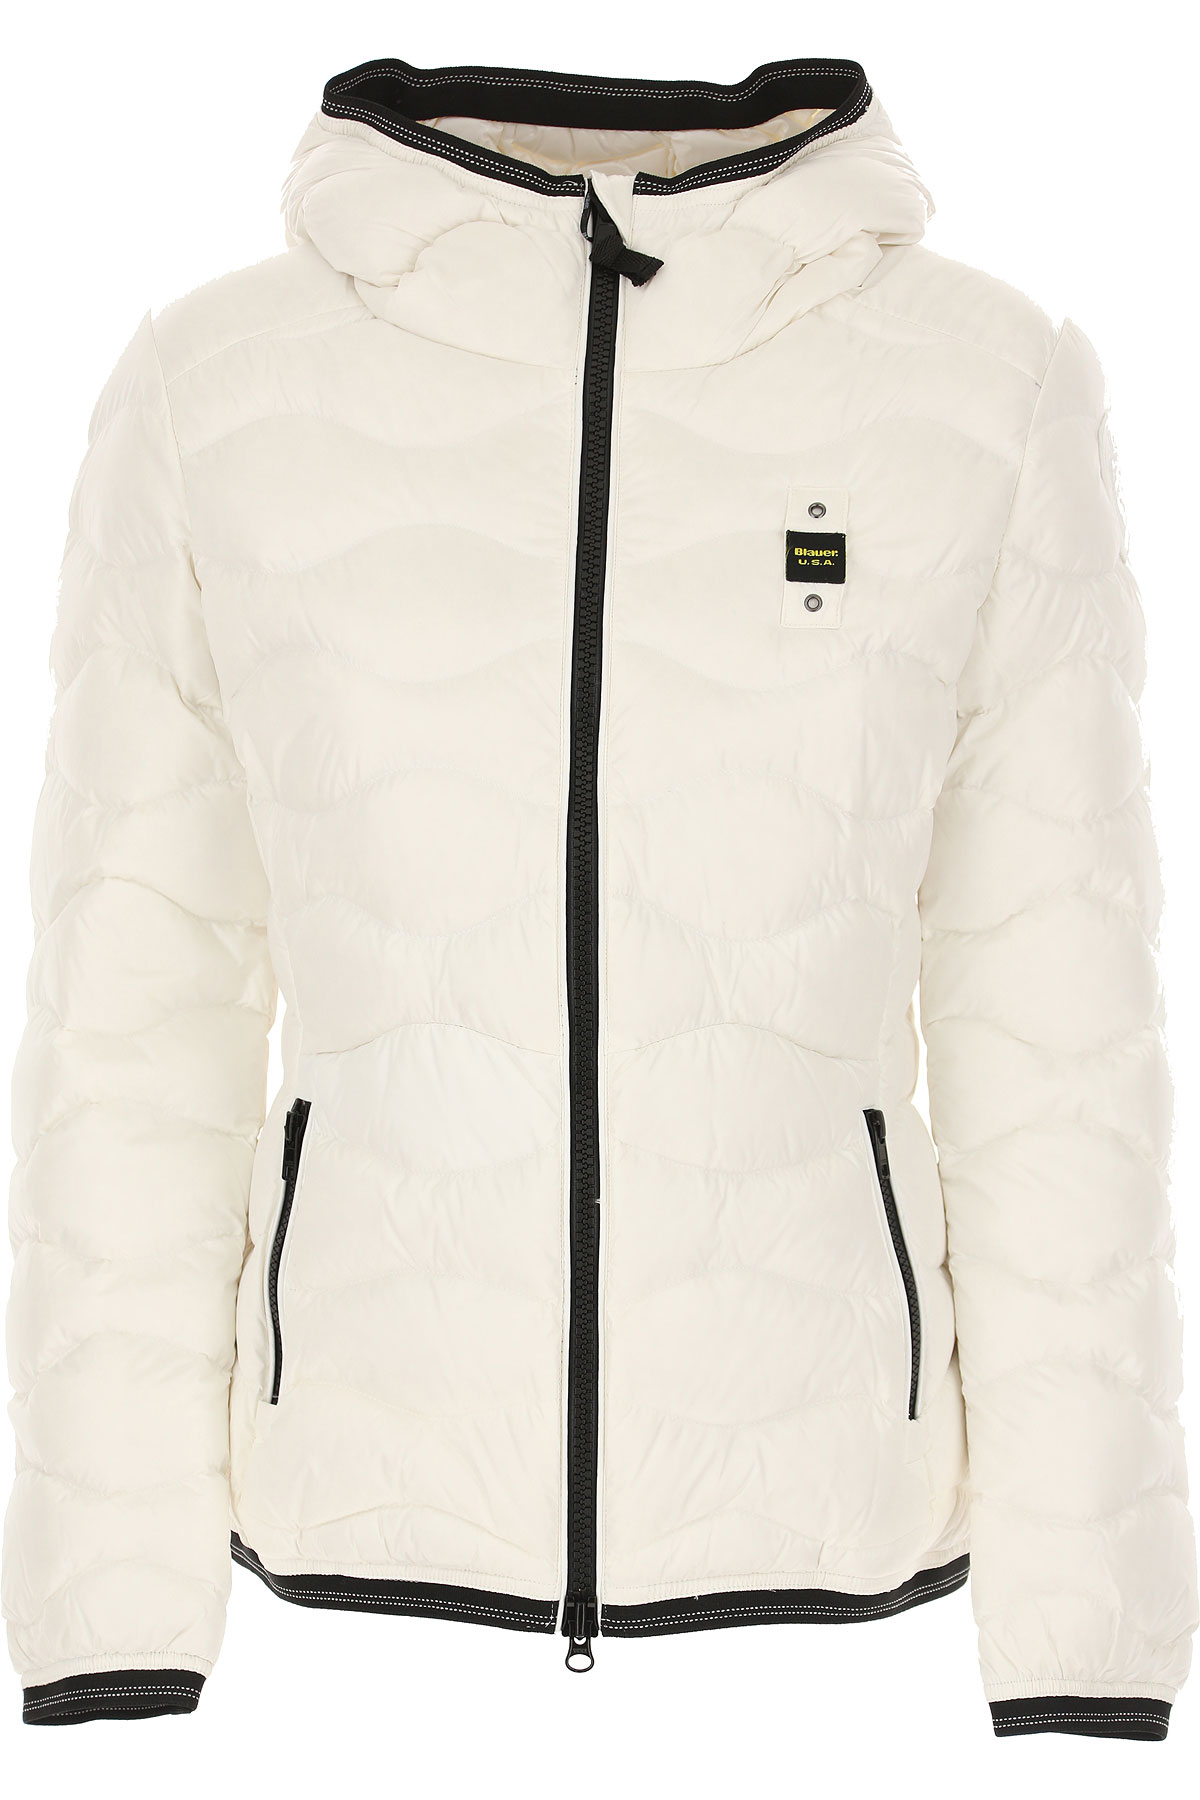 Blauer Down Jacket for Women, Puffer Ski Jacket On Sale, White, polyester, 2019, 4 6